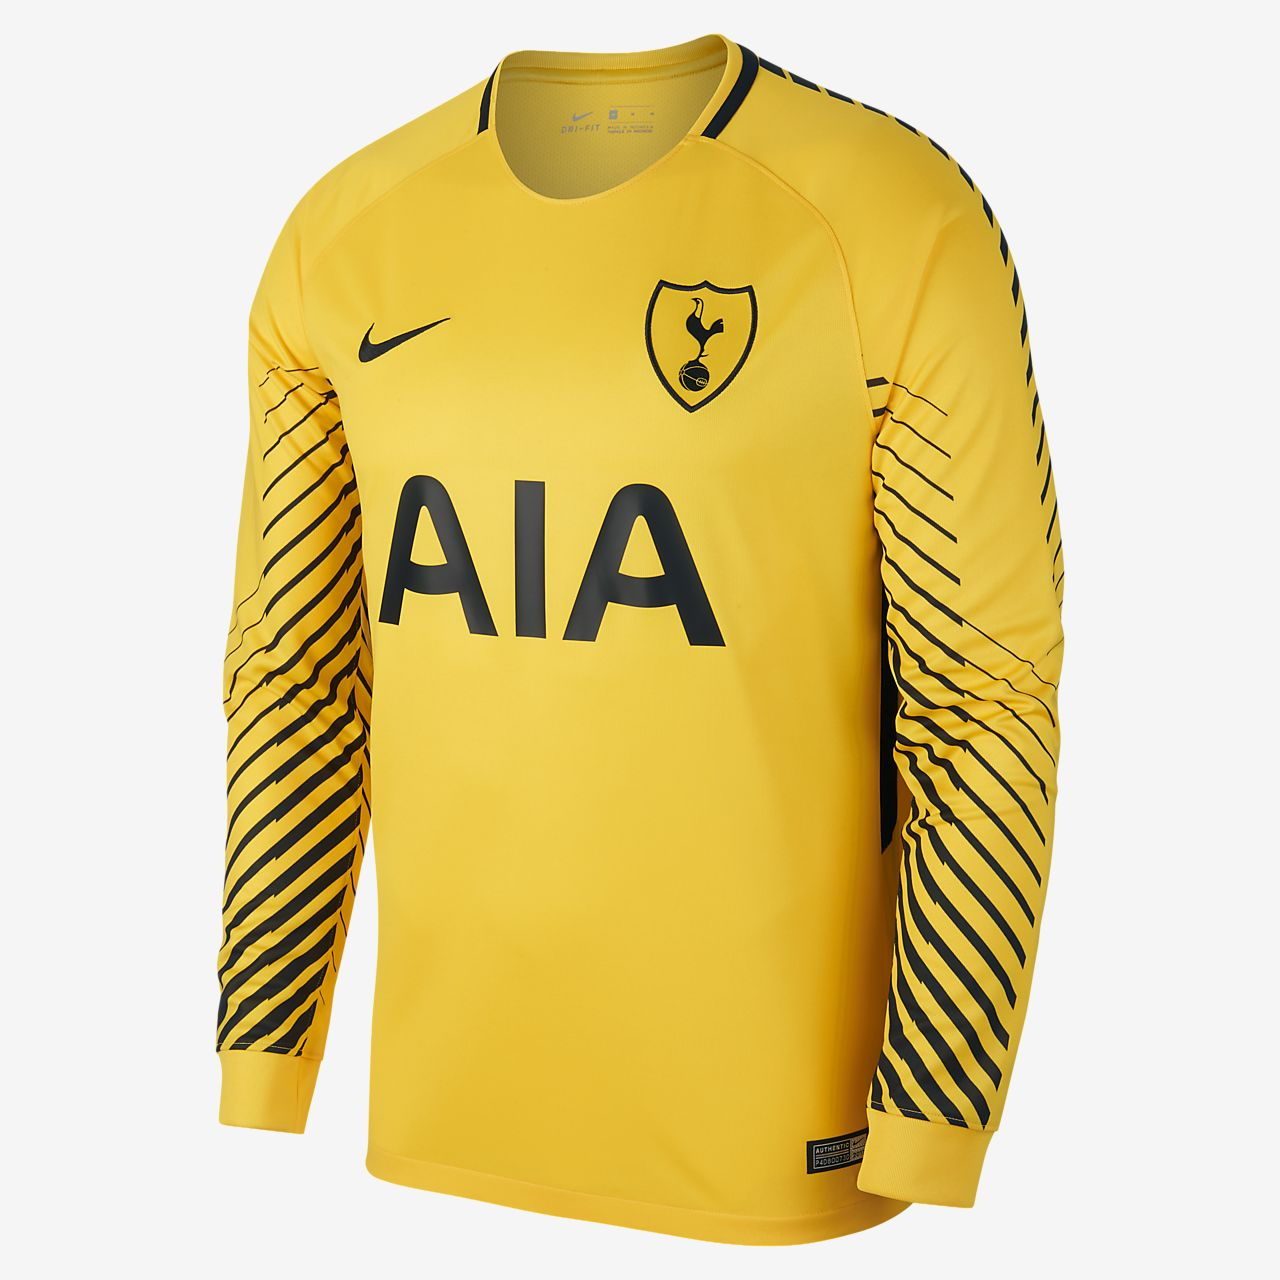 f361c9078 ... Camisola de futebol de manga comprida 2017 18 Tottenham Hotspur Stadium  Goalkeeper para homem